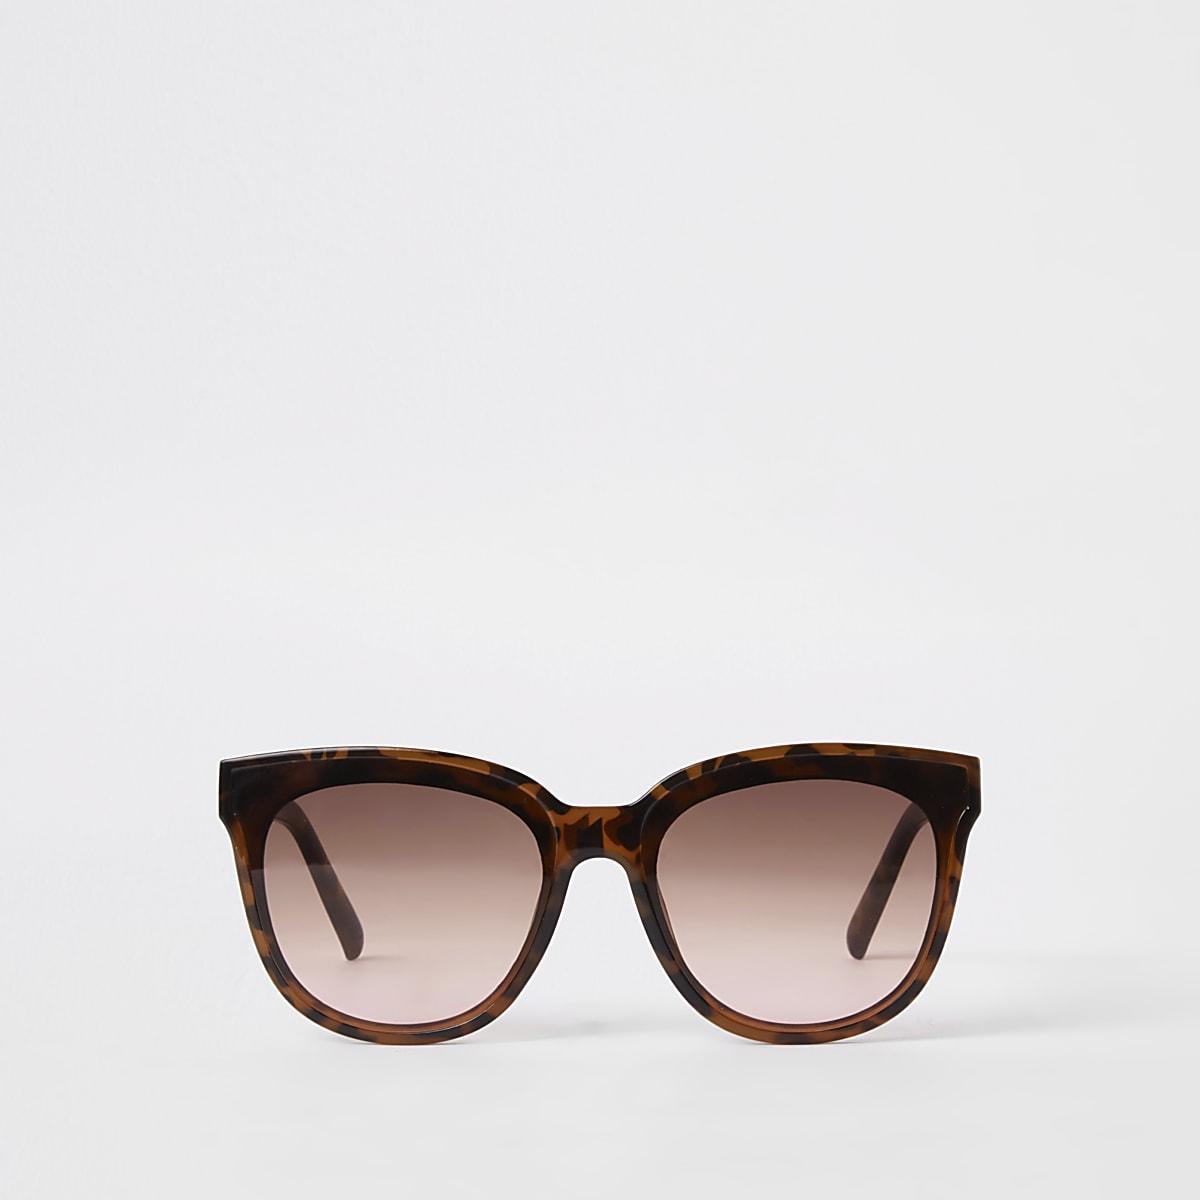 Brown tortoise shell square glam sunglasses